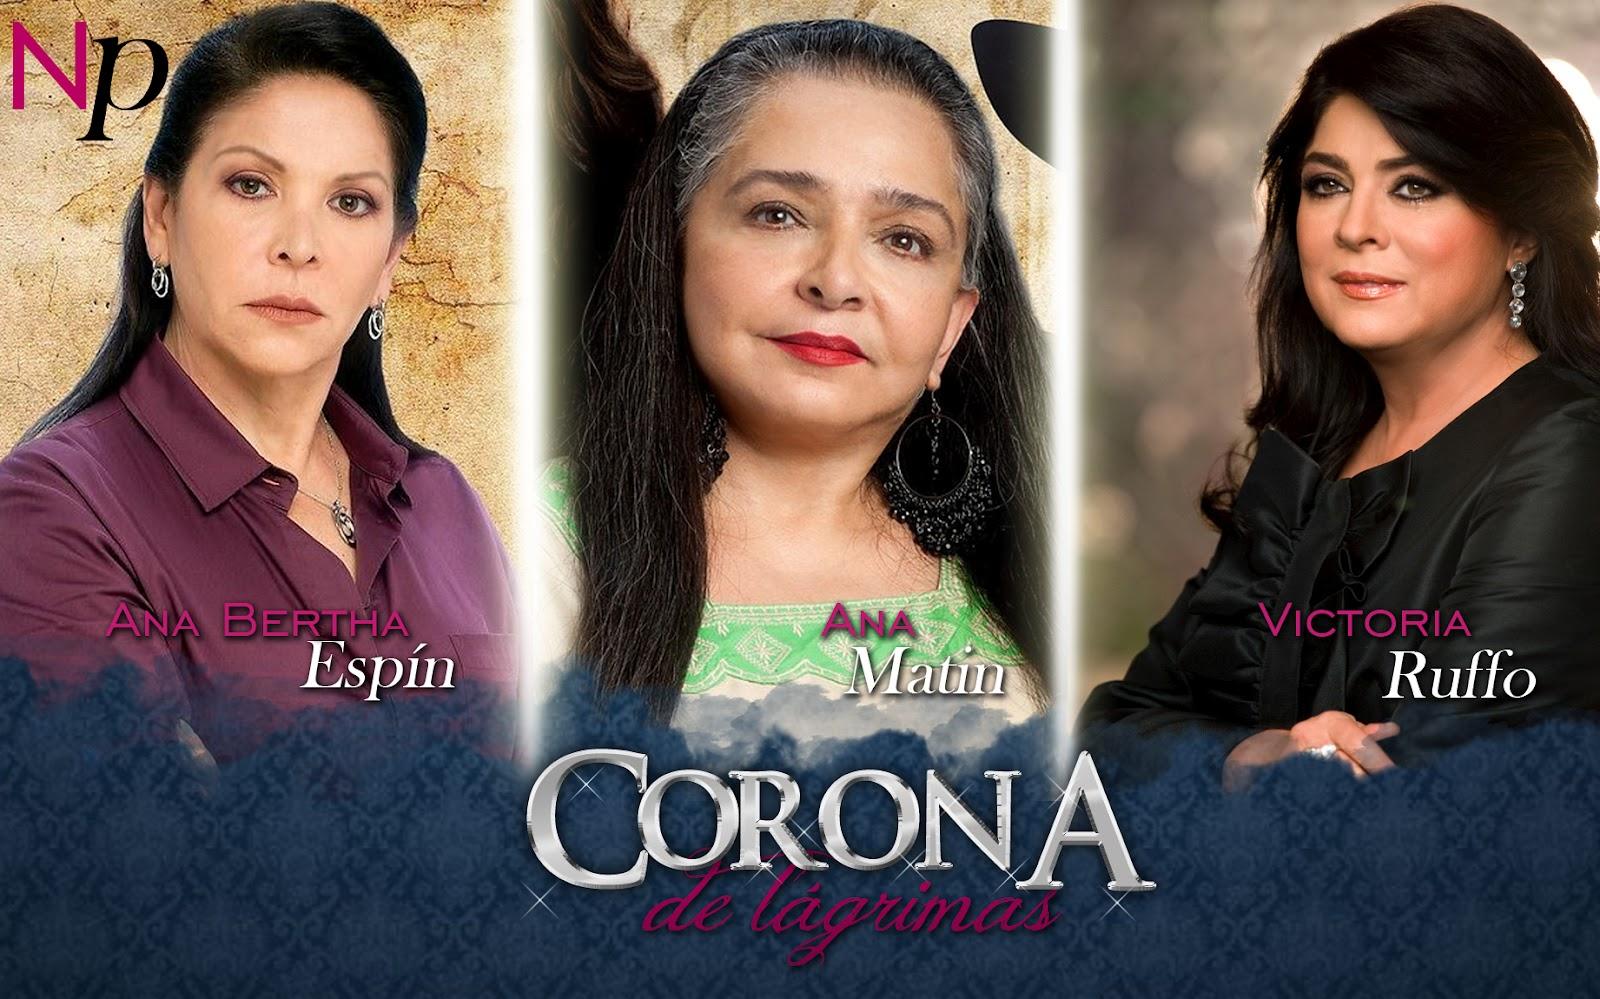 http://3.bp.blogspot.com/-ckVcRXIrzoE/T3eT2lc3beI/AAAAAAAAACI/sGSj_kQsDz8/s1600/corona+de+lagrimas+victoria+ruffo+ana+martin+ana+bertha+espín+jose+alberto+castro+televisa+telenovela.jpg